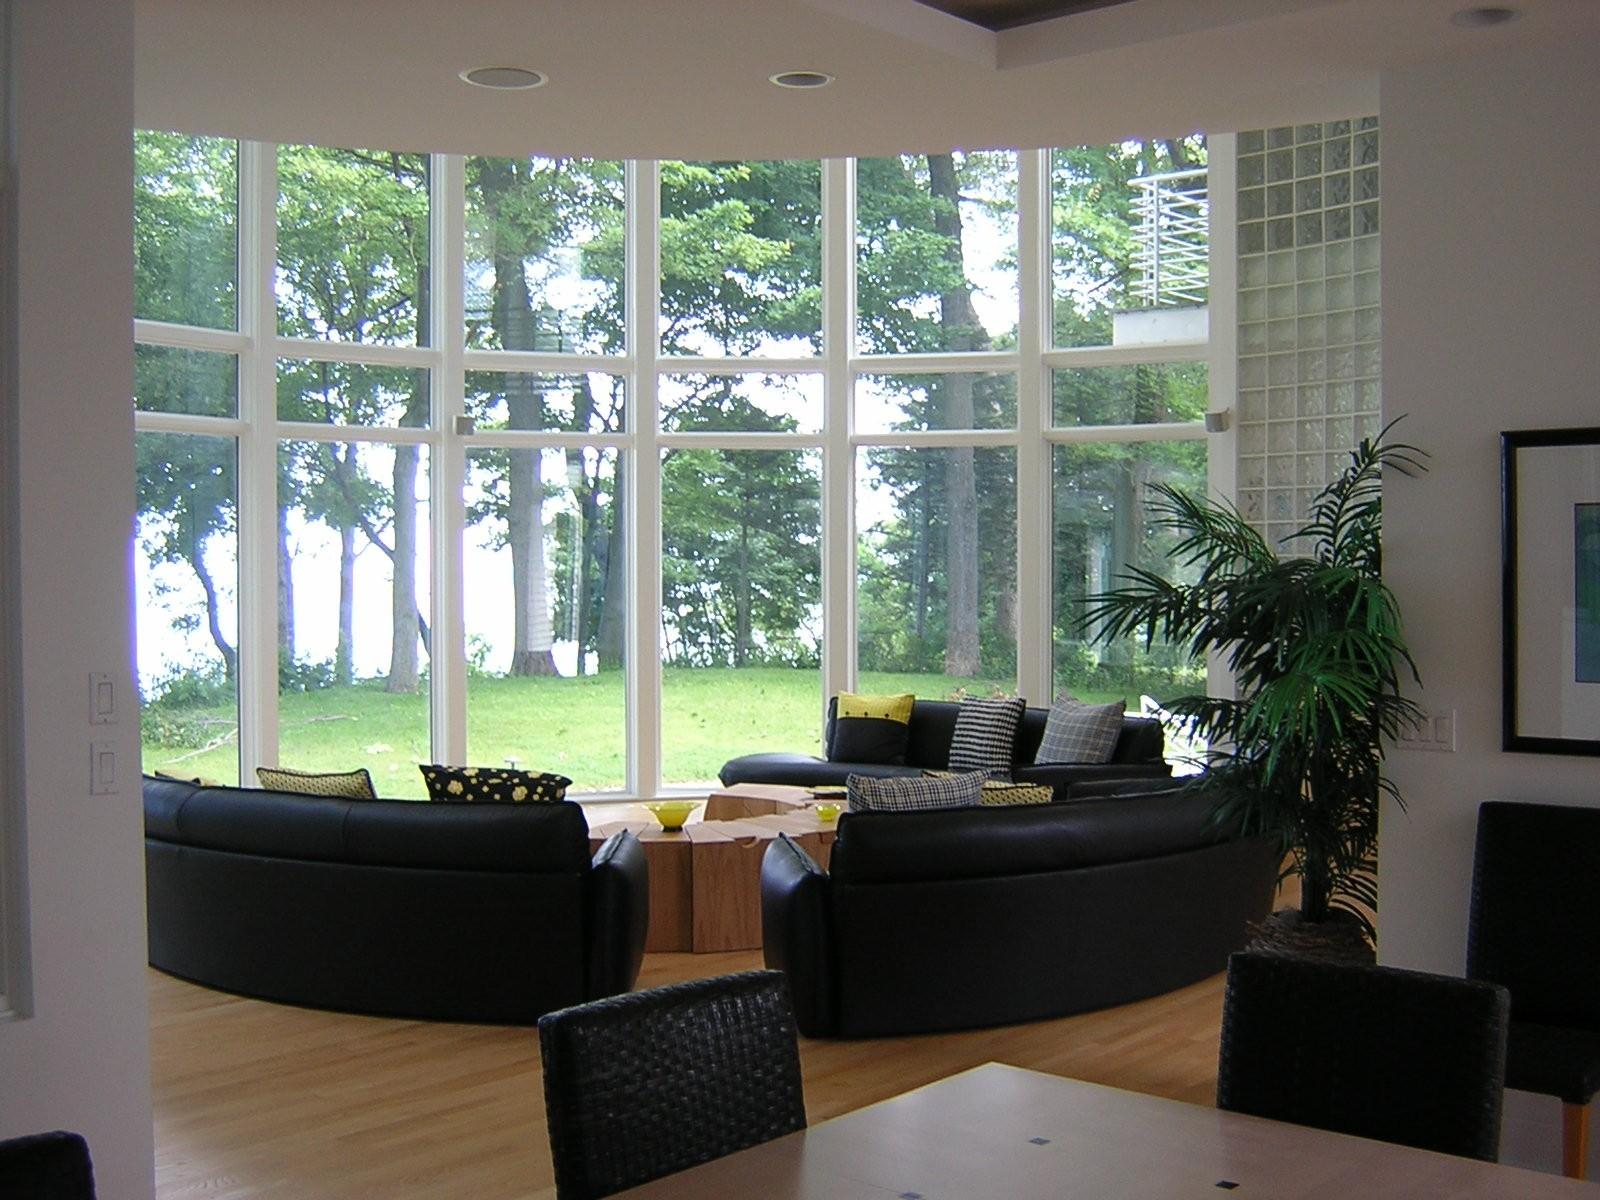 Real Estate Photography - 15930 Lake Ave, Union Pier, MI, 49129 - Location 8